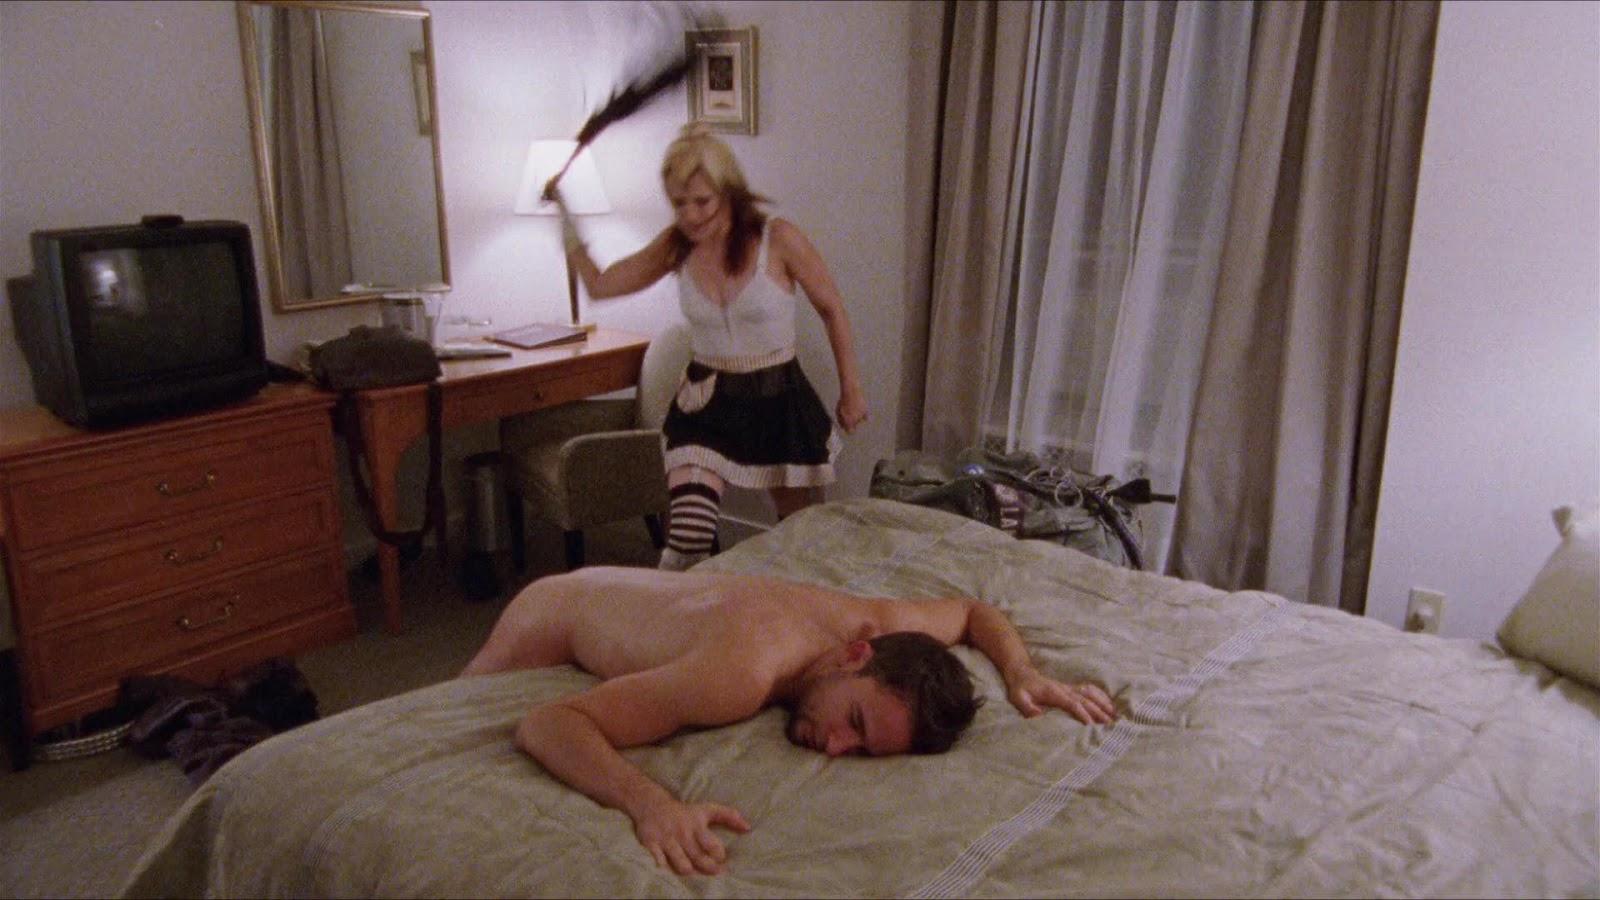 kinky penetration sexual